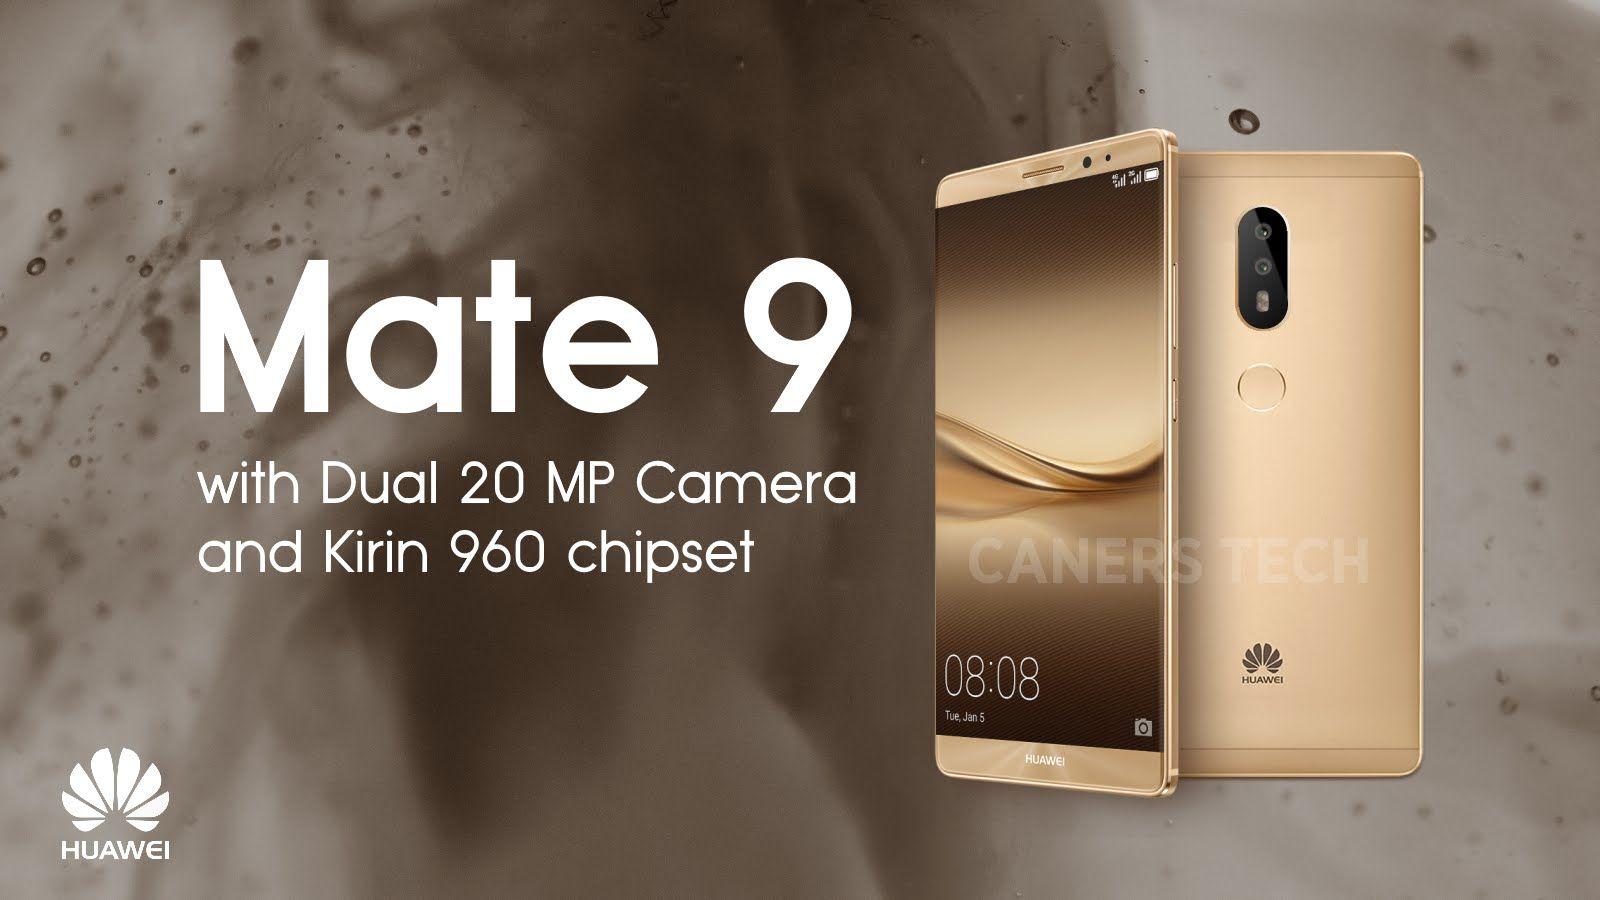 Смартфон Huawei Mate 9 получит двойную камеру 20 Mp и Kirin 960